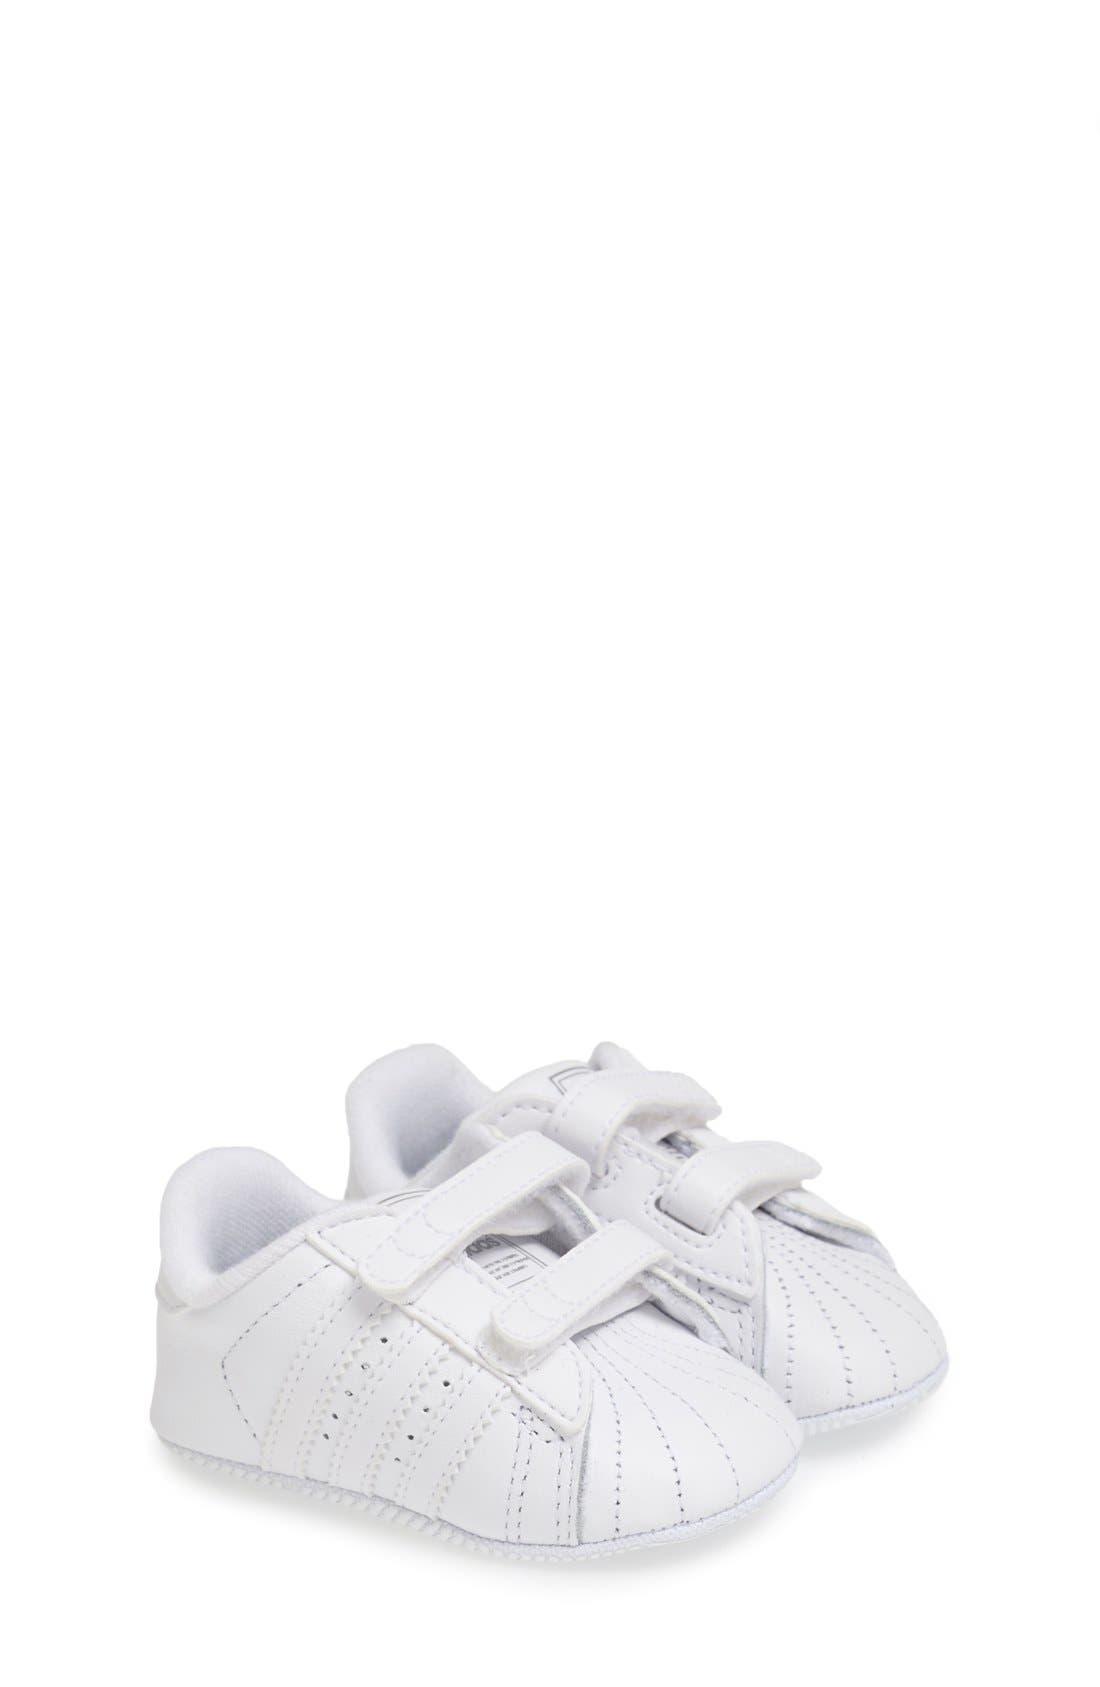 Main Image - adidas 'Superstar 2' Crib Shoe (Baby)